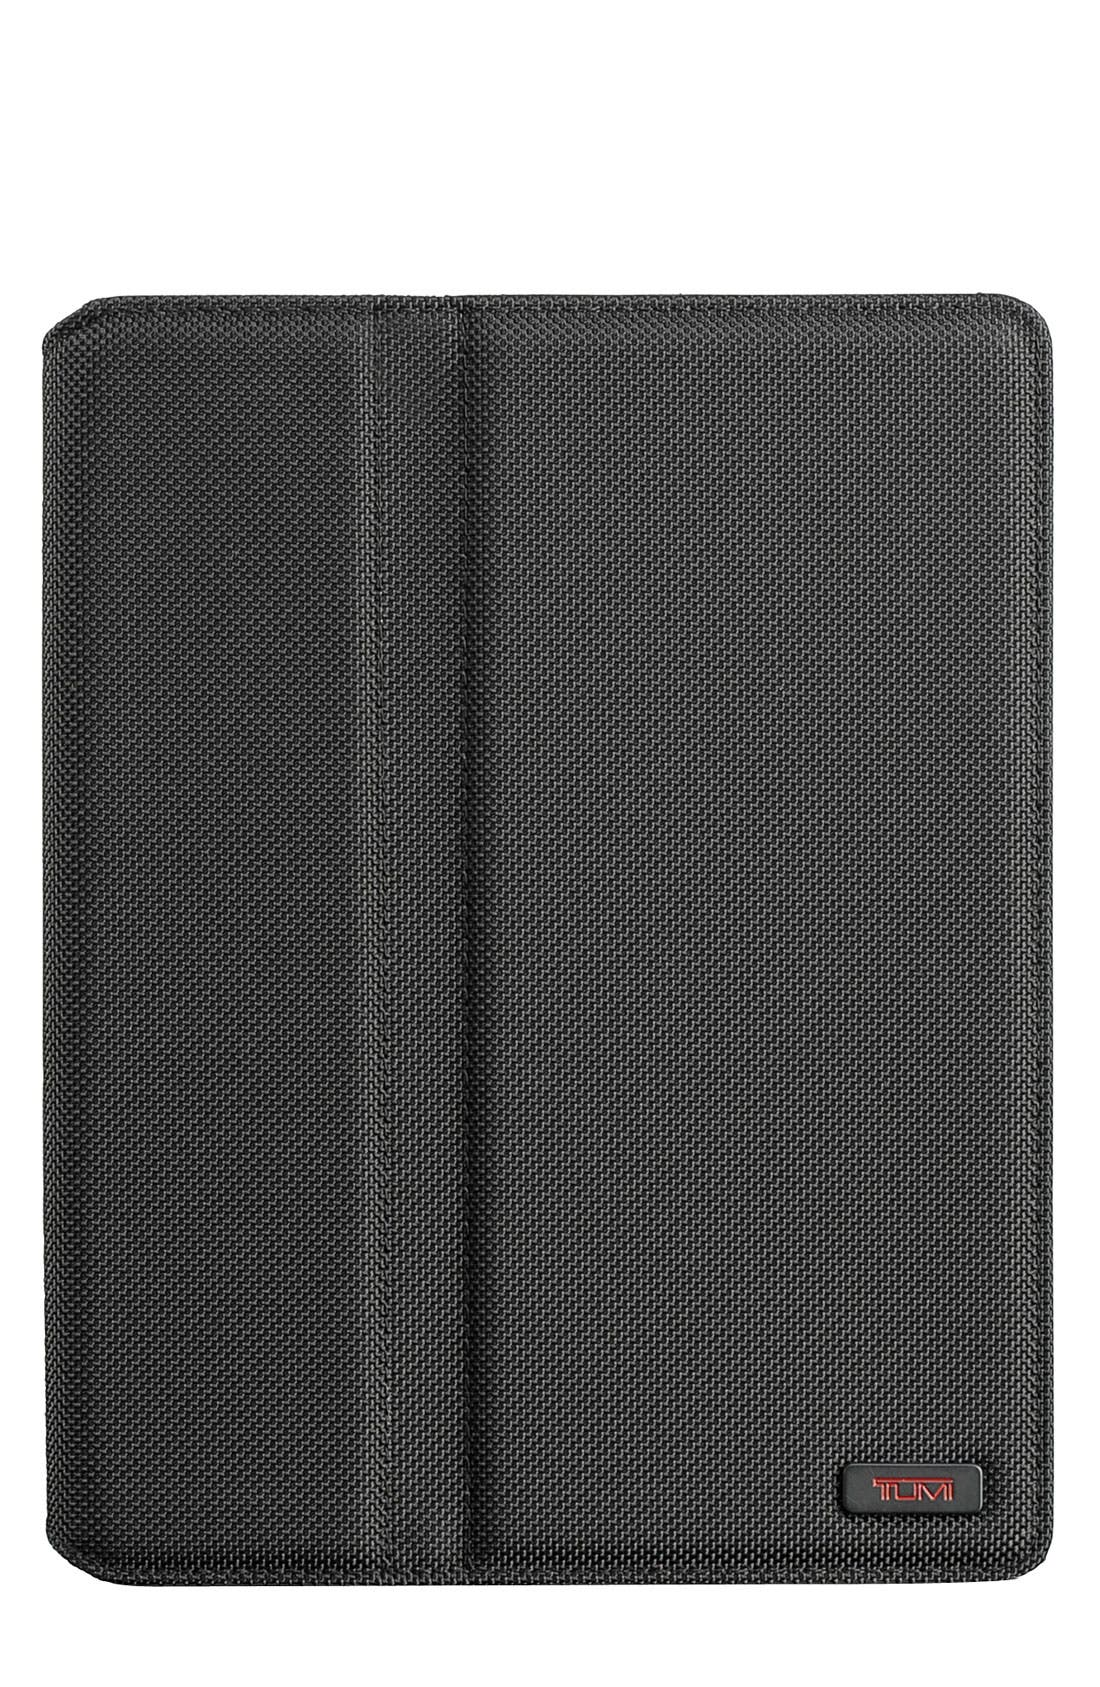 Ballistic Nylon iPad 2 Cover,                             Main thumbnail 1, color,                             Black